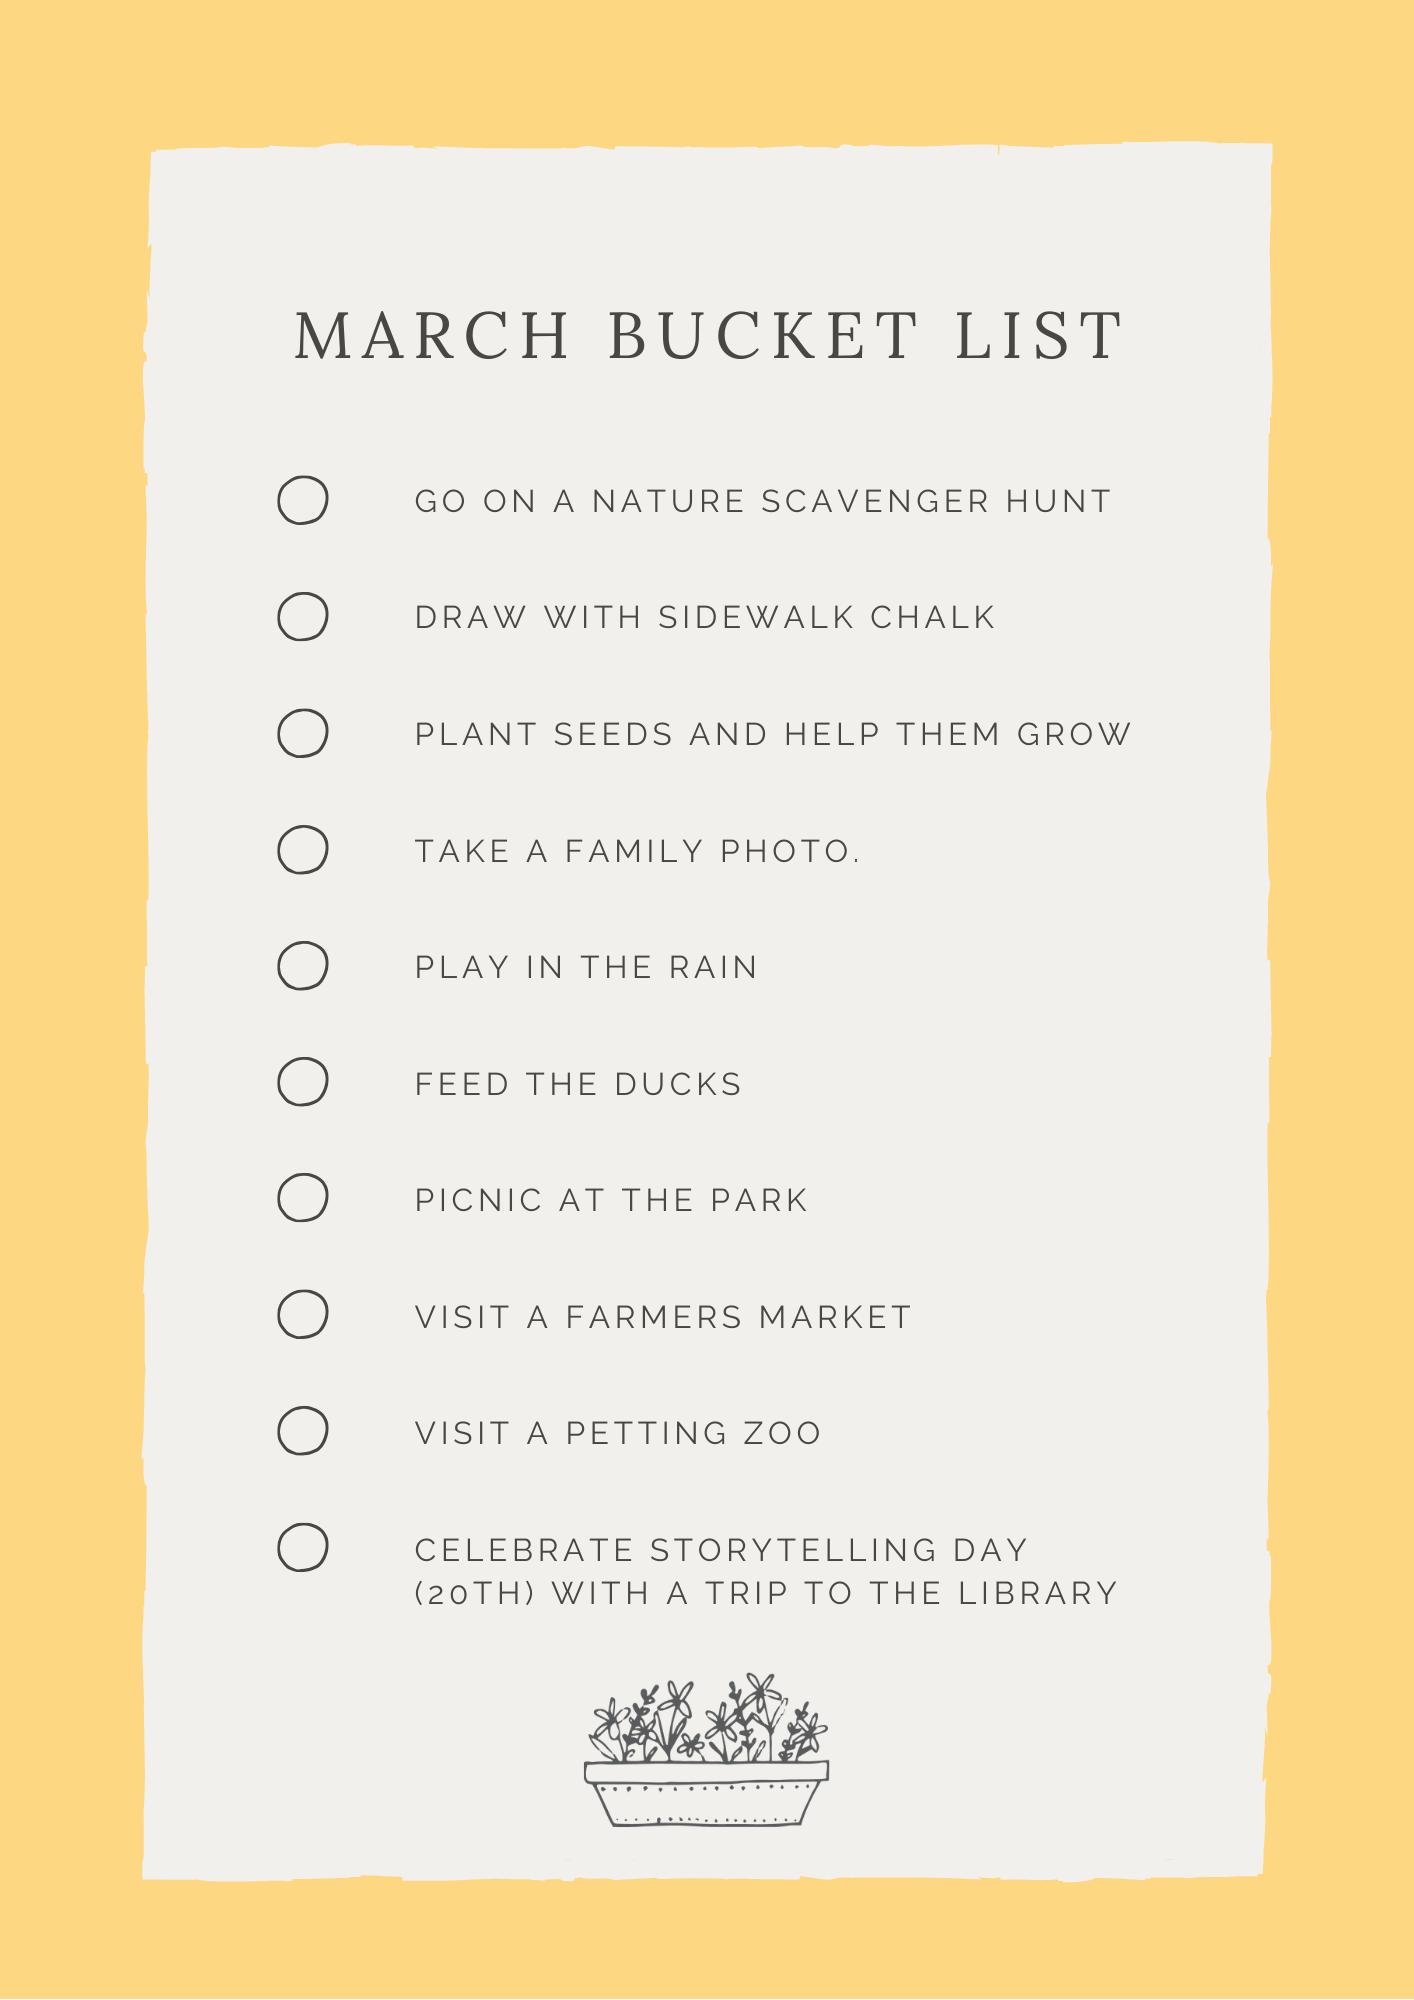 March Bucket List 2020 | Arizona Photographer